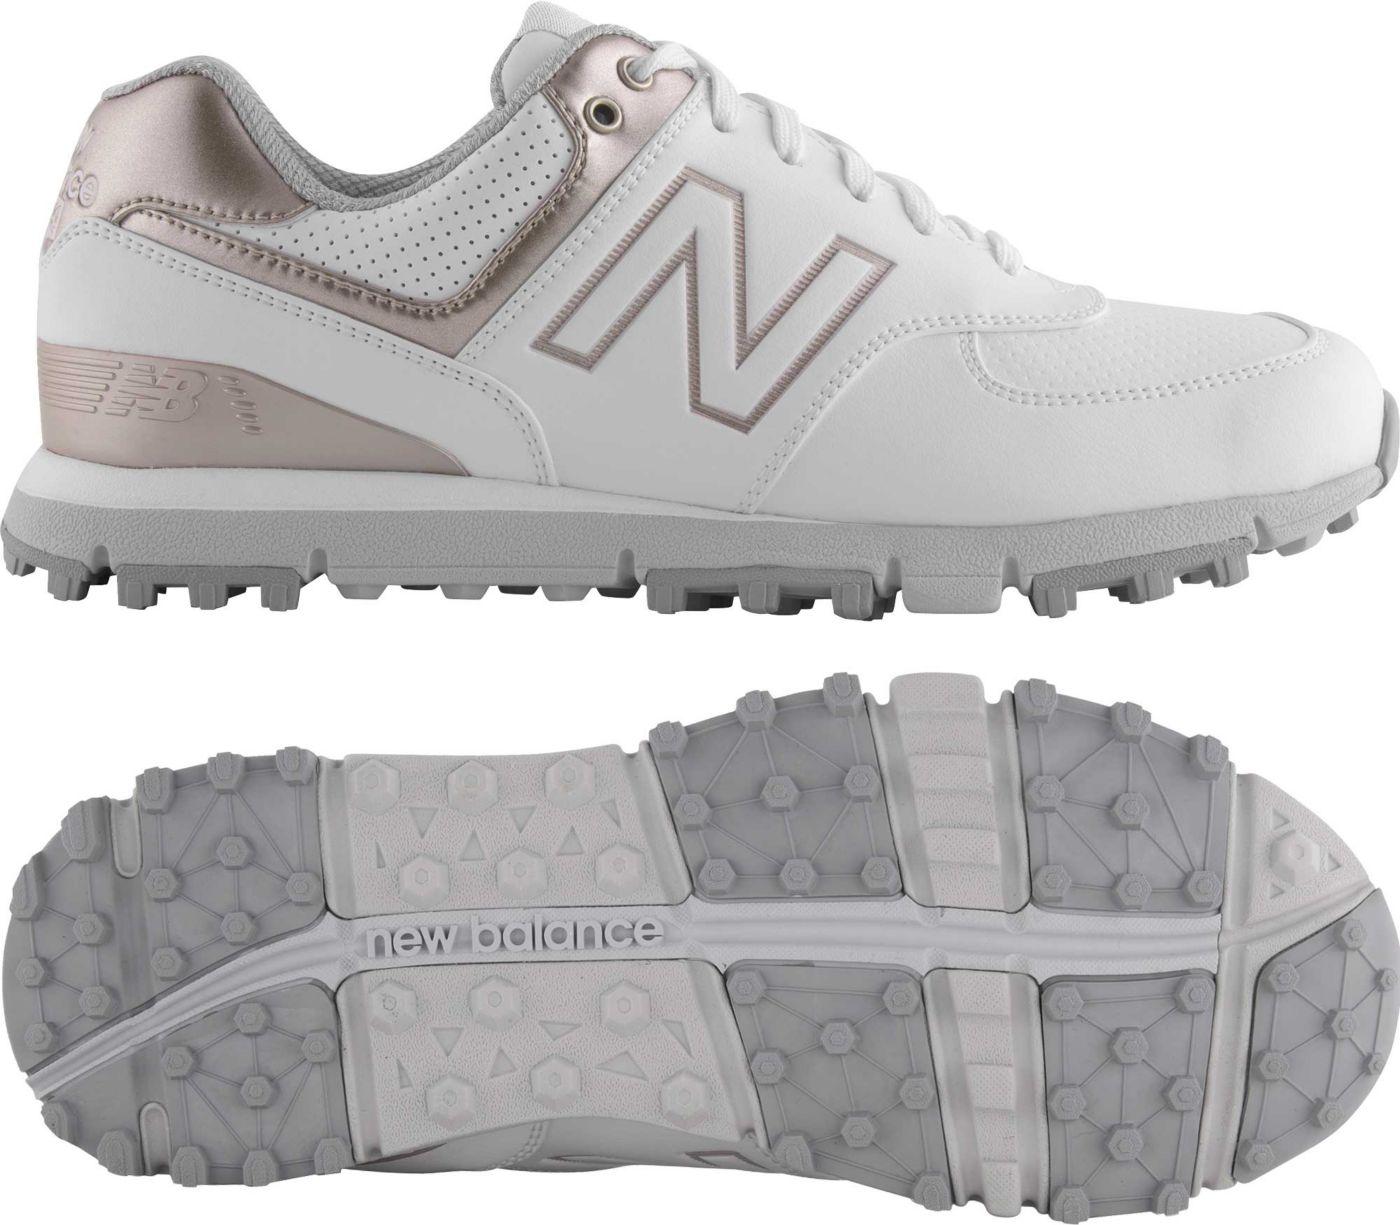 New Balance Women's 574 SL Golf Shoes